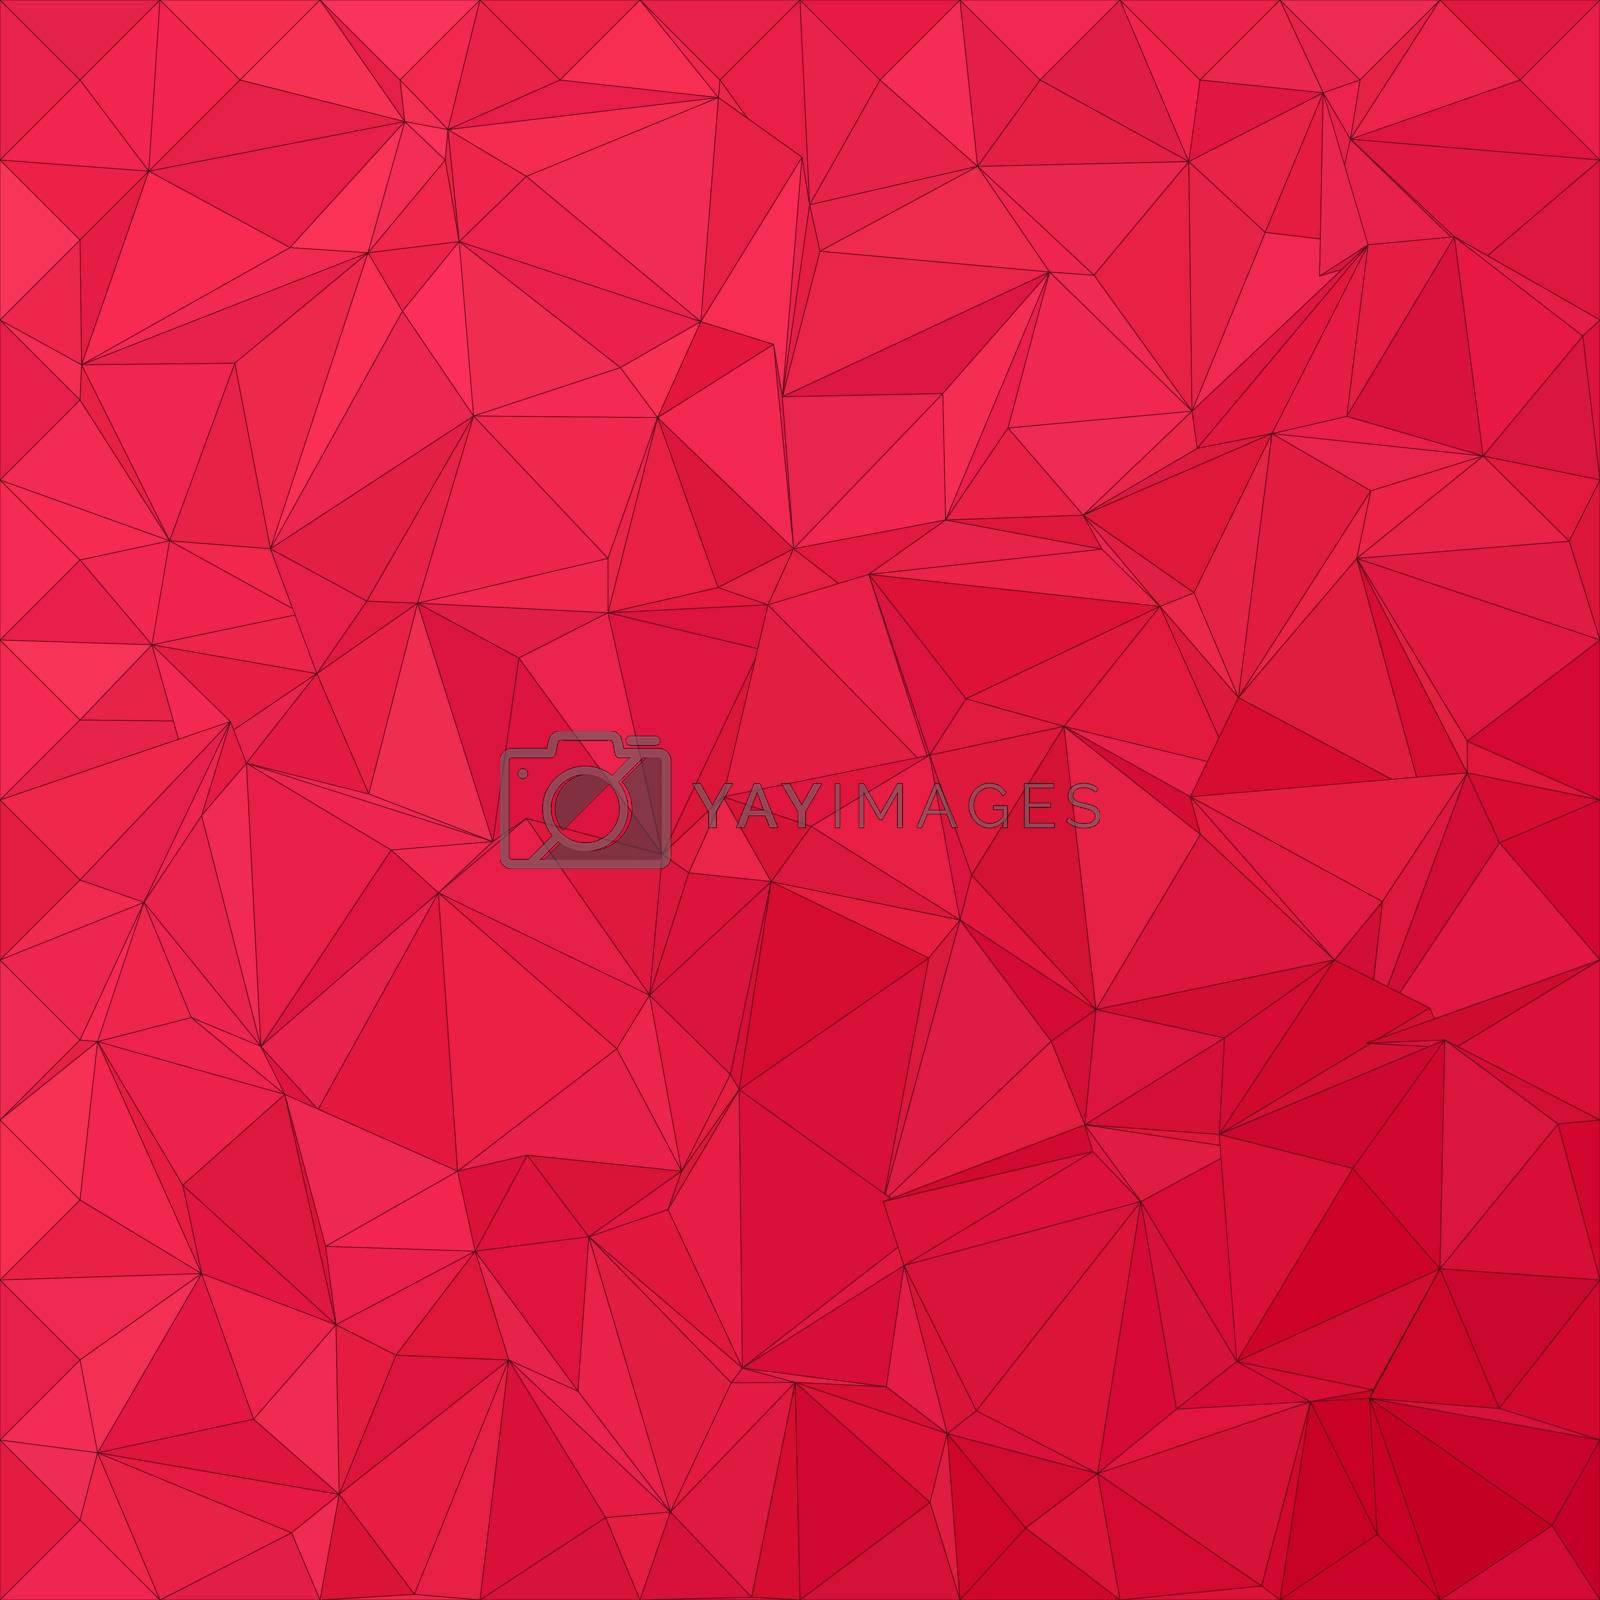 Crimson irregular triangle mosaic vector background design